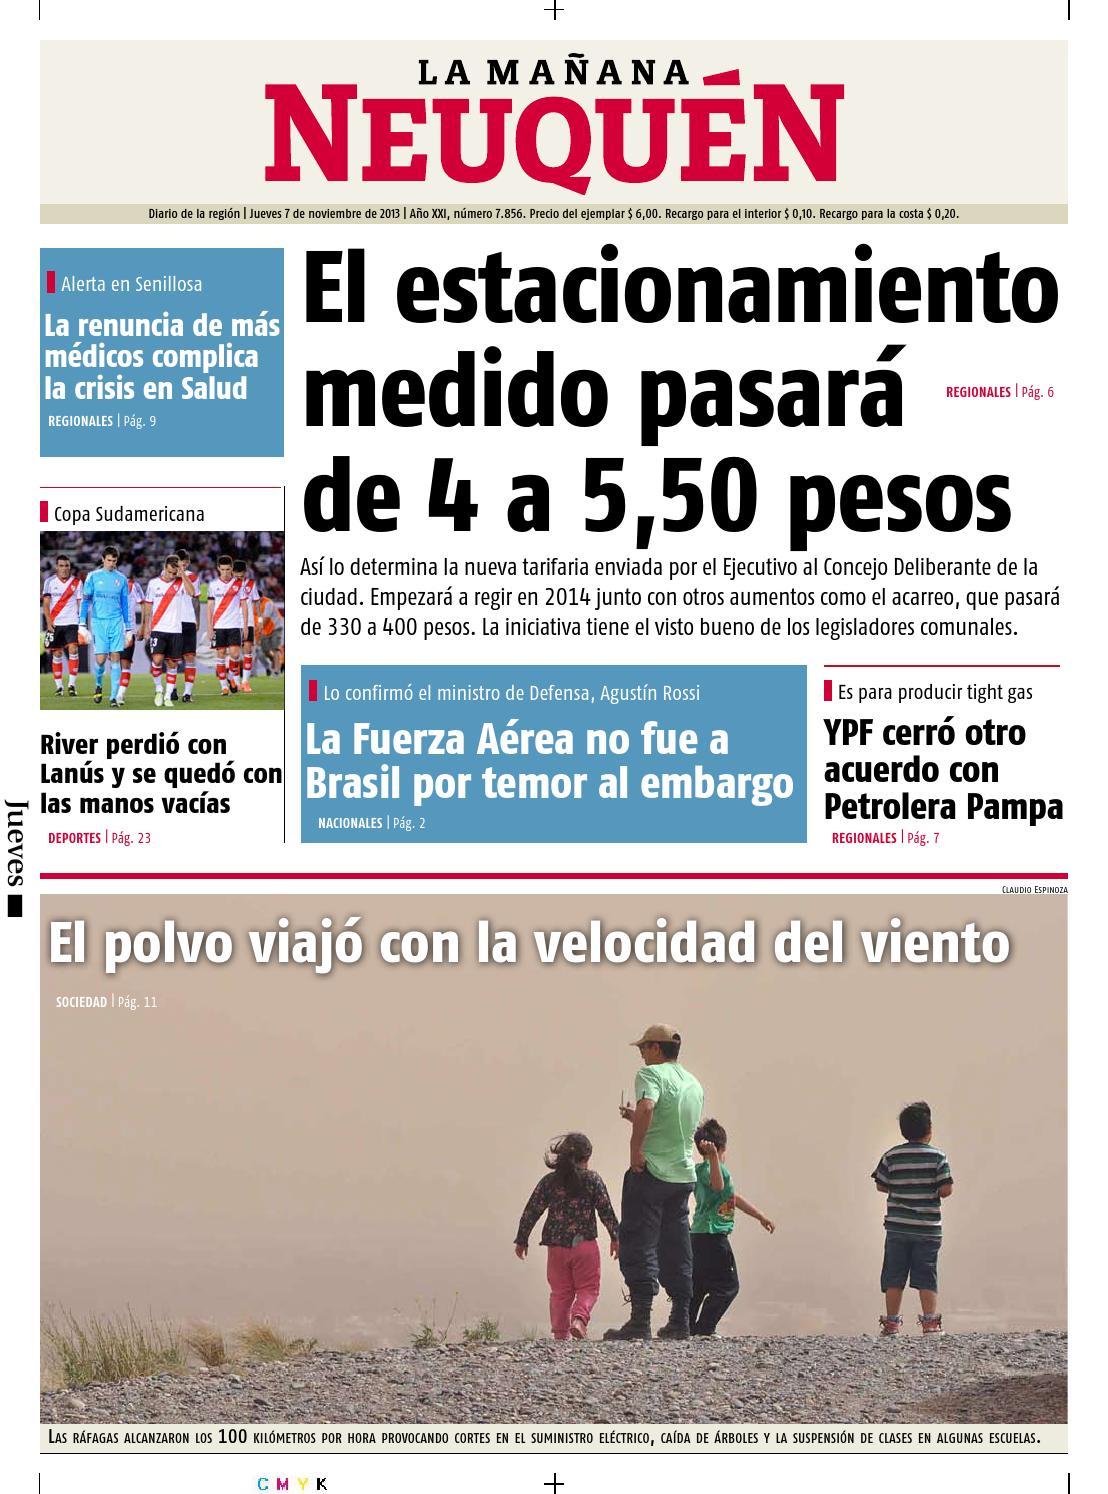 LMN - Día del Canillita by Diario LM Neuquén - issuu b7a88e2840e